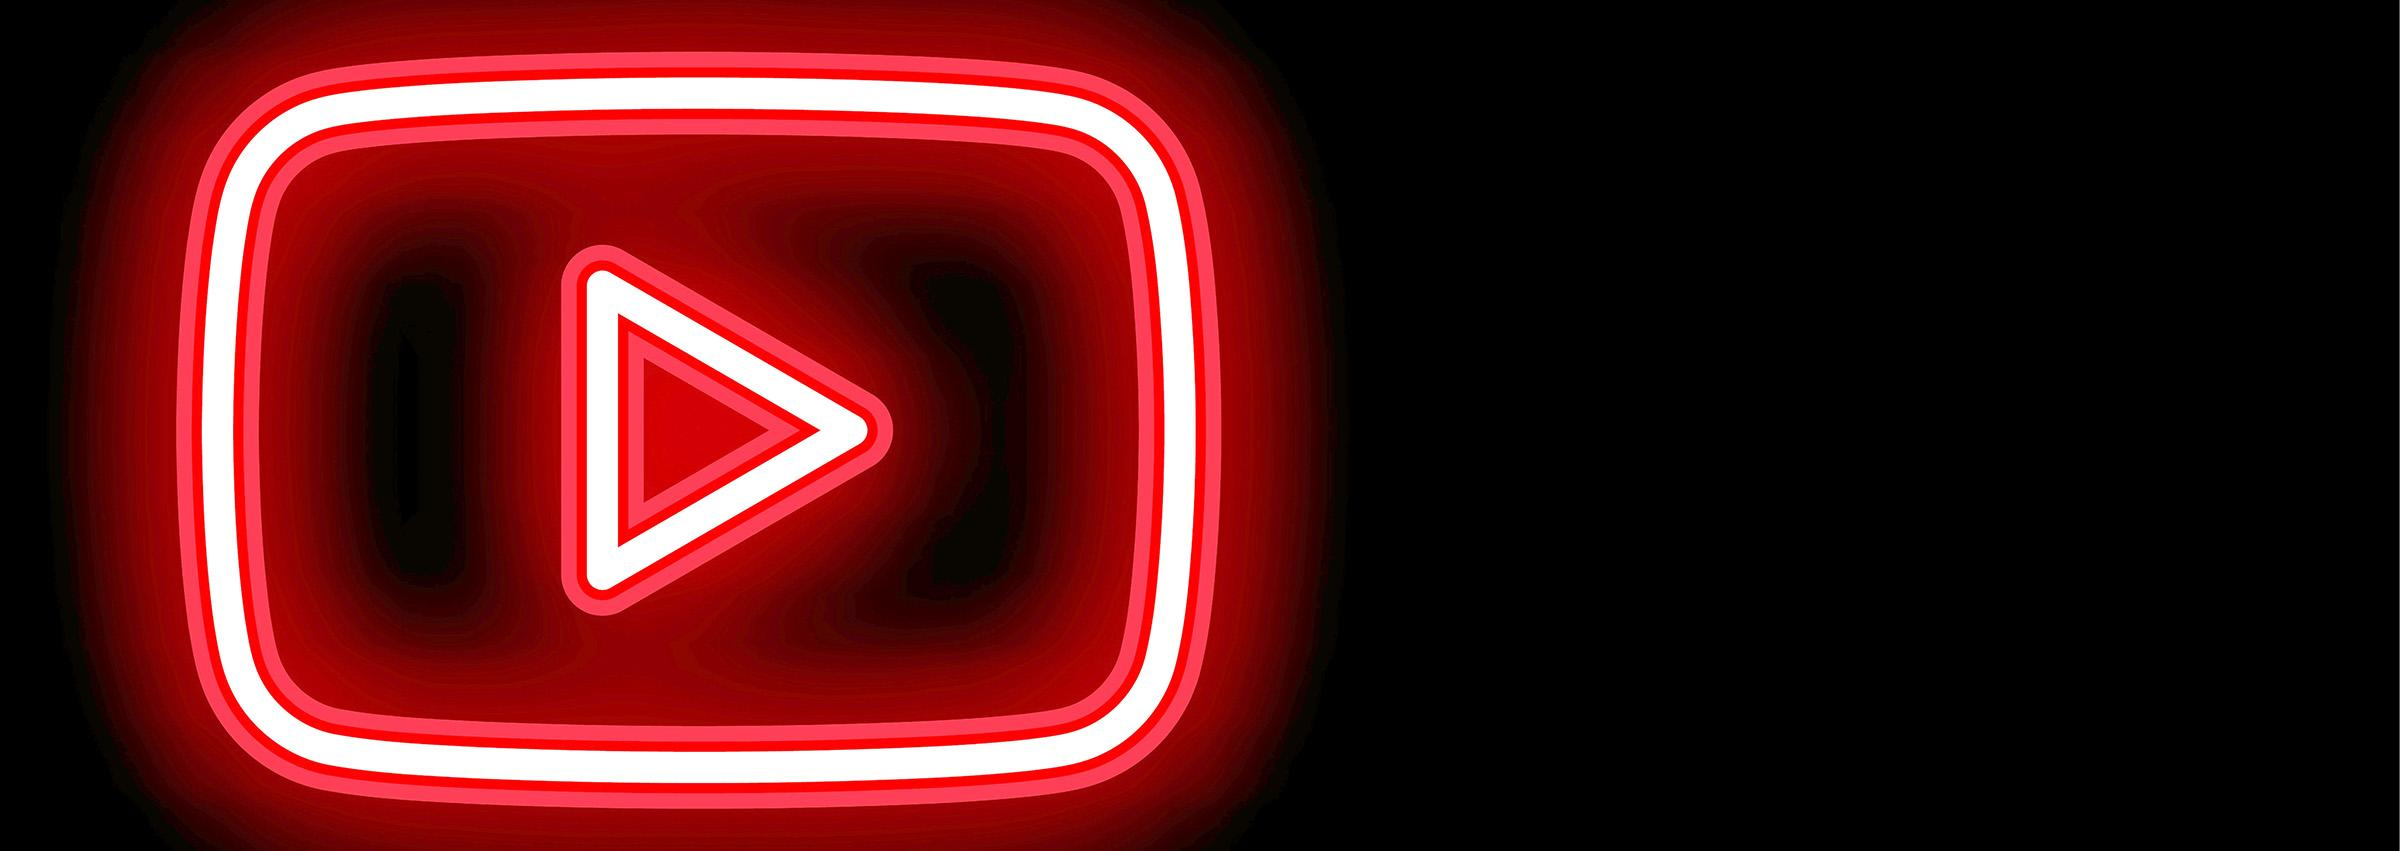 Neon YouTube logo